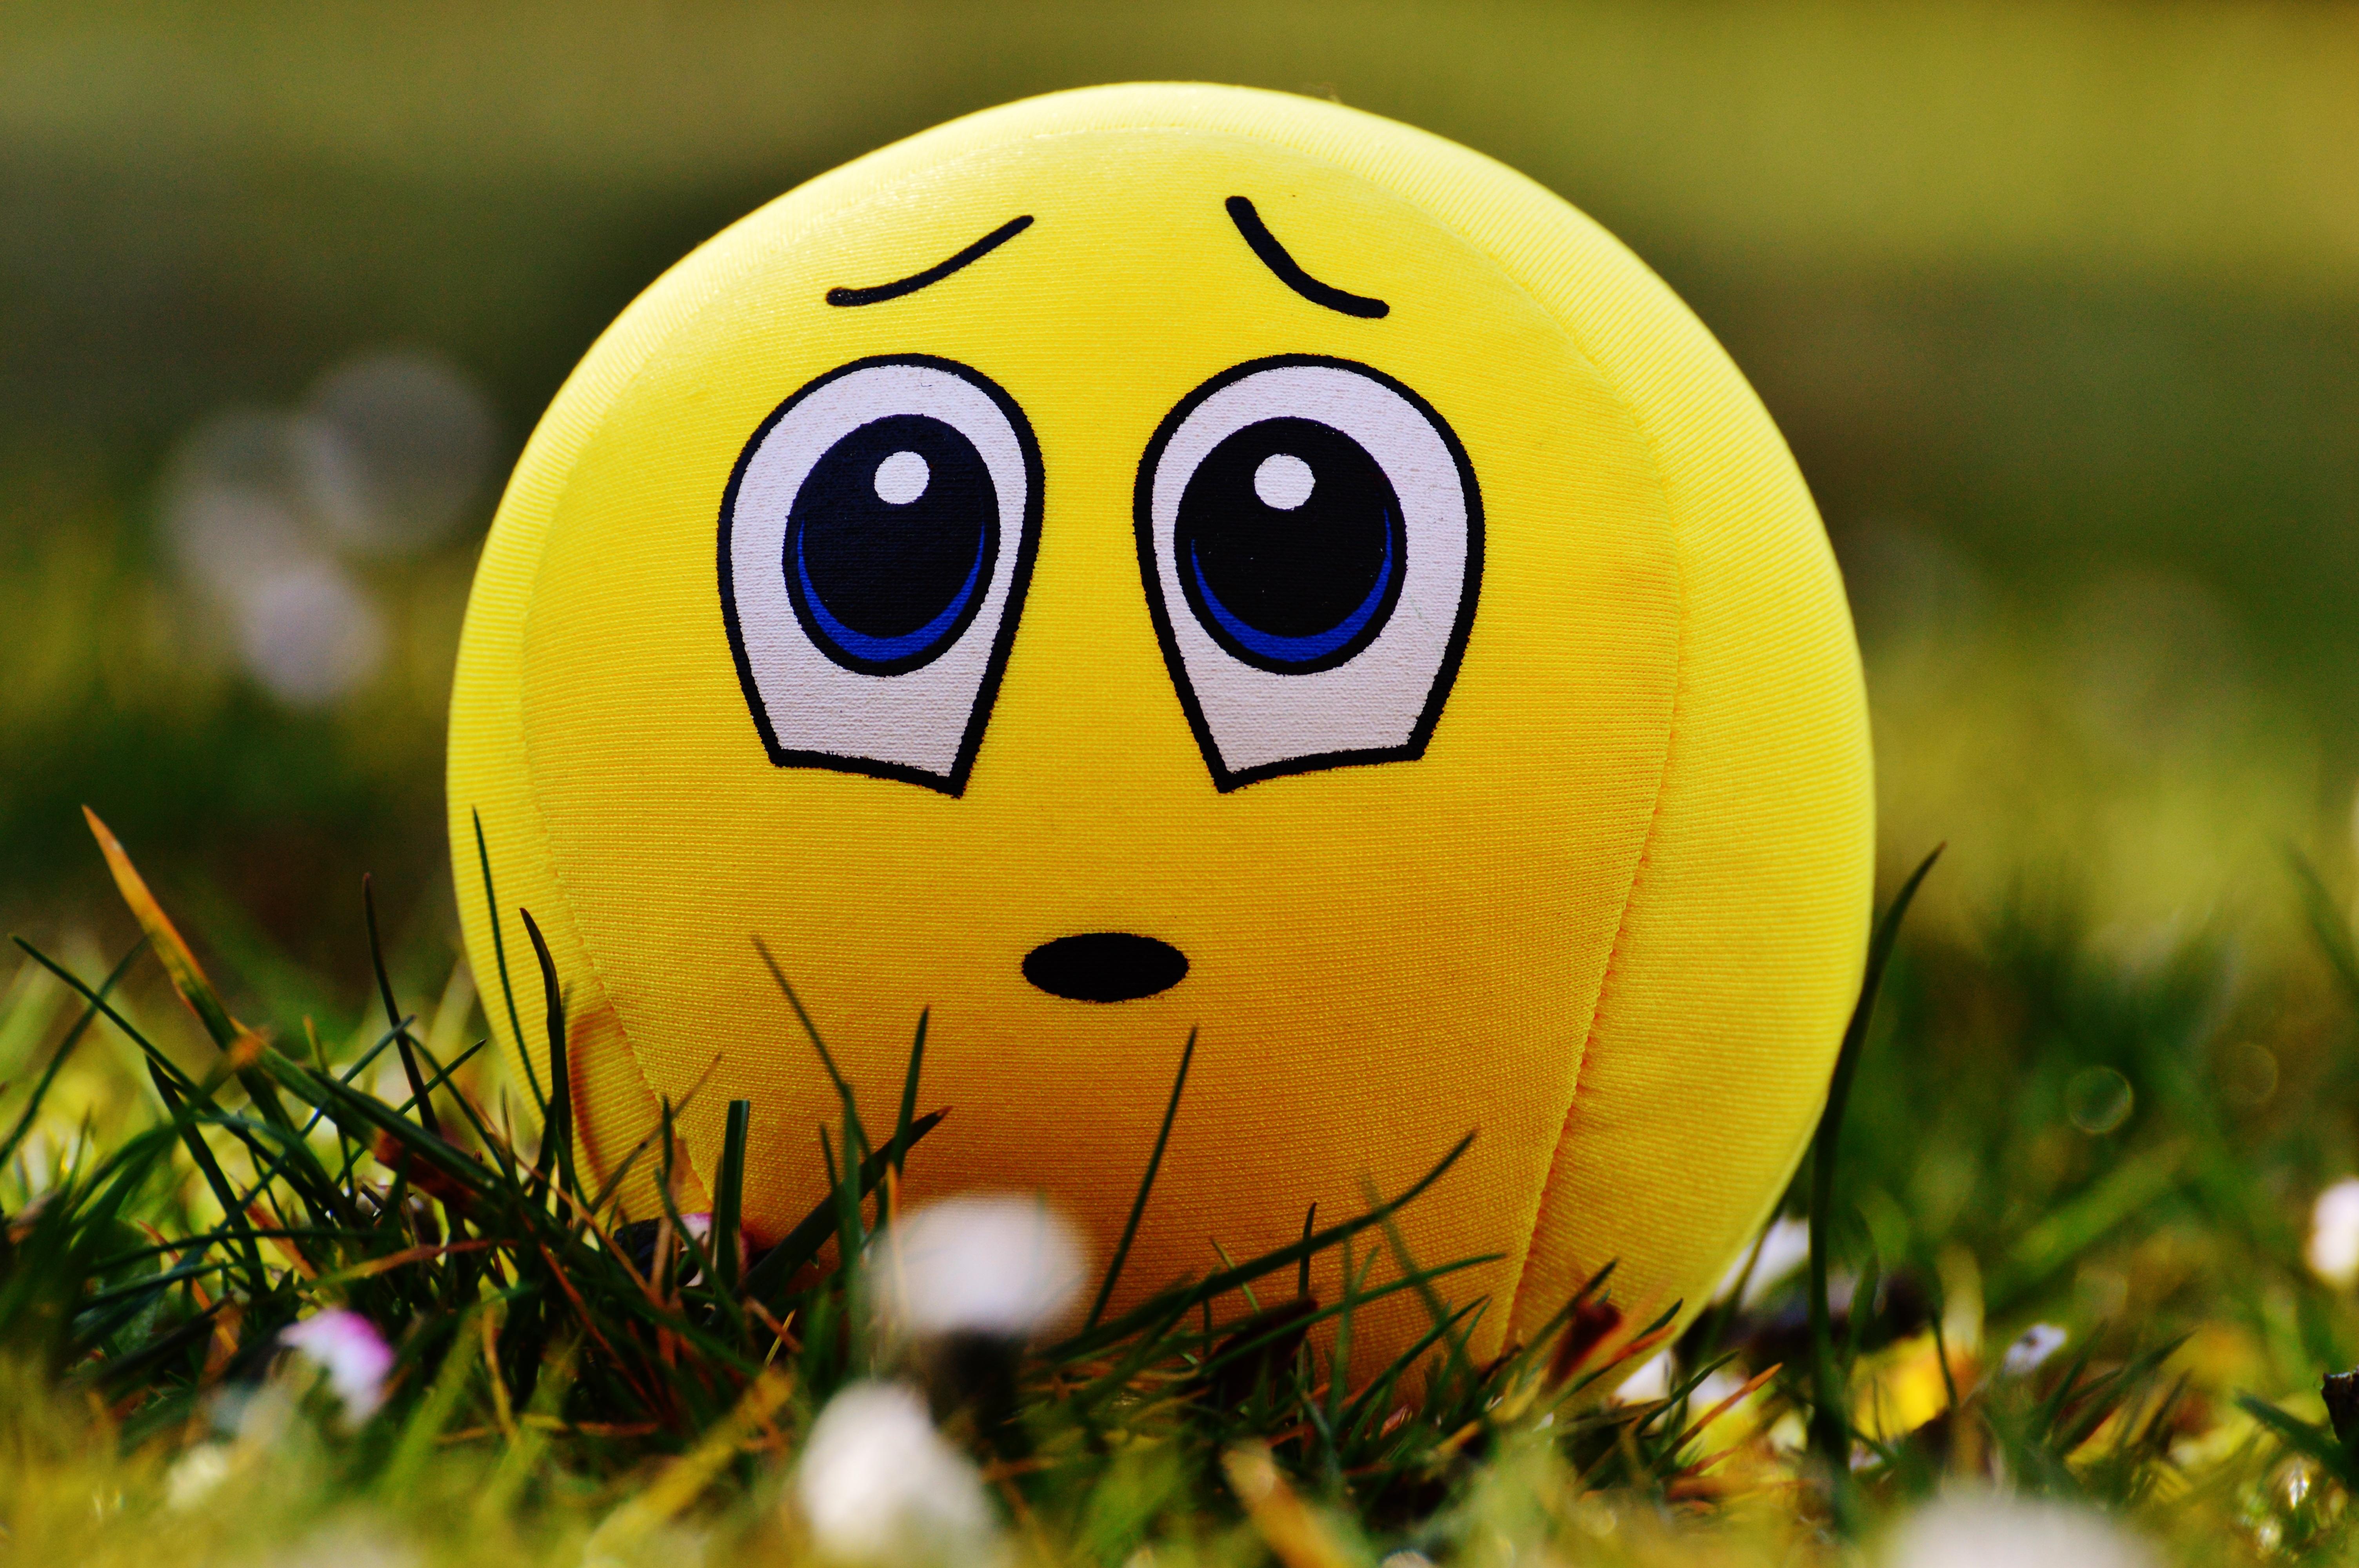 Gambar Padang Rumput Manis Bunga Imut Musim Semi Hijau